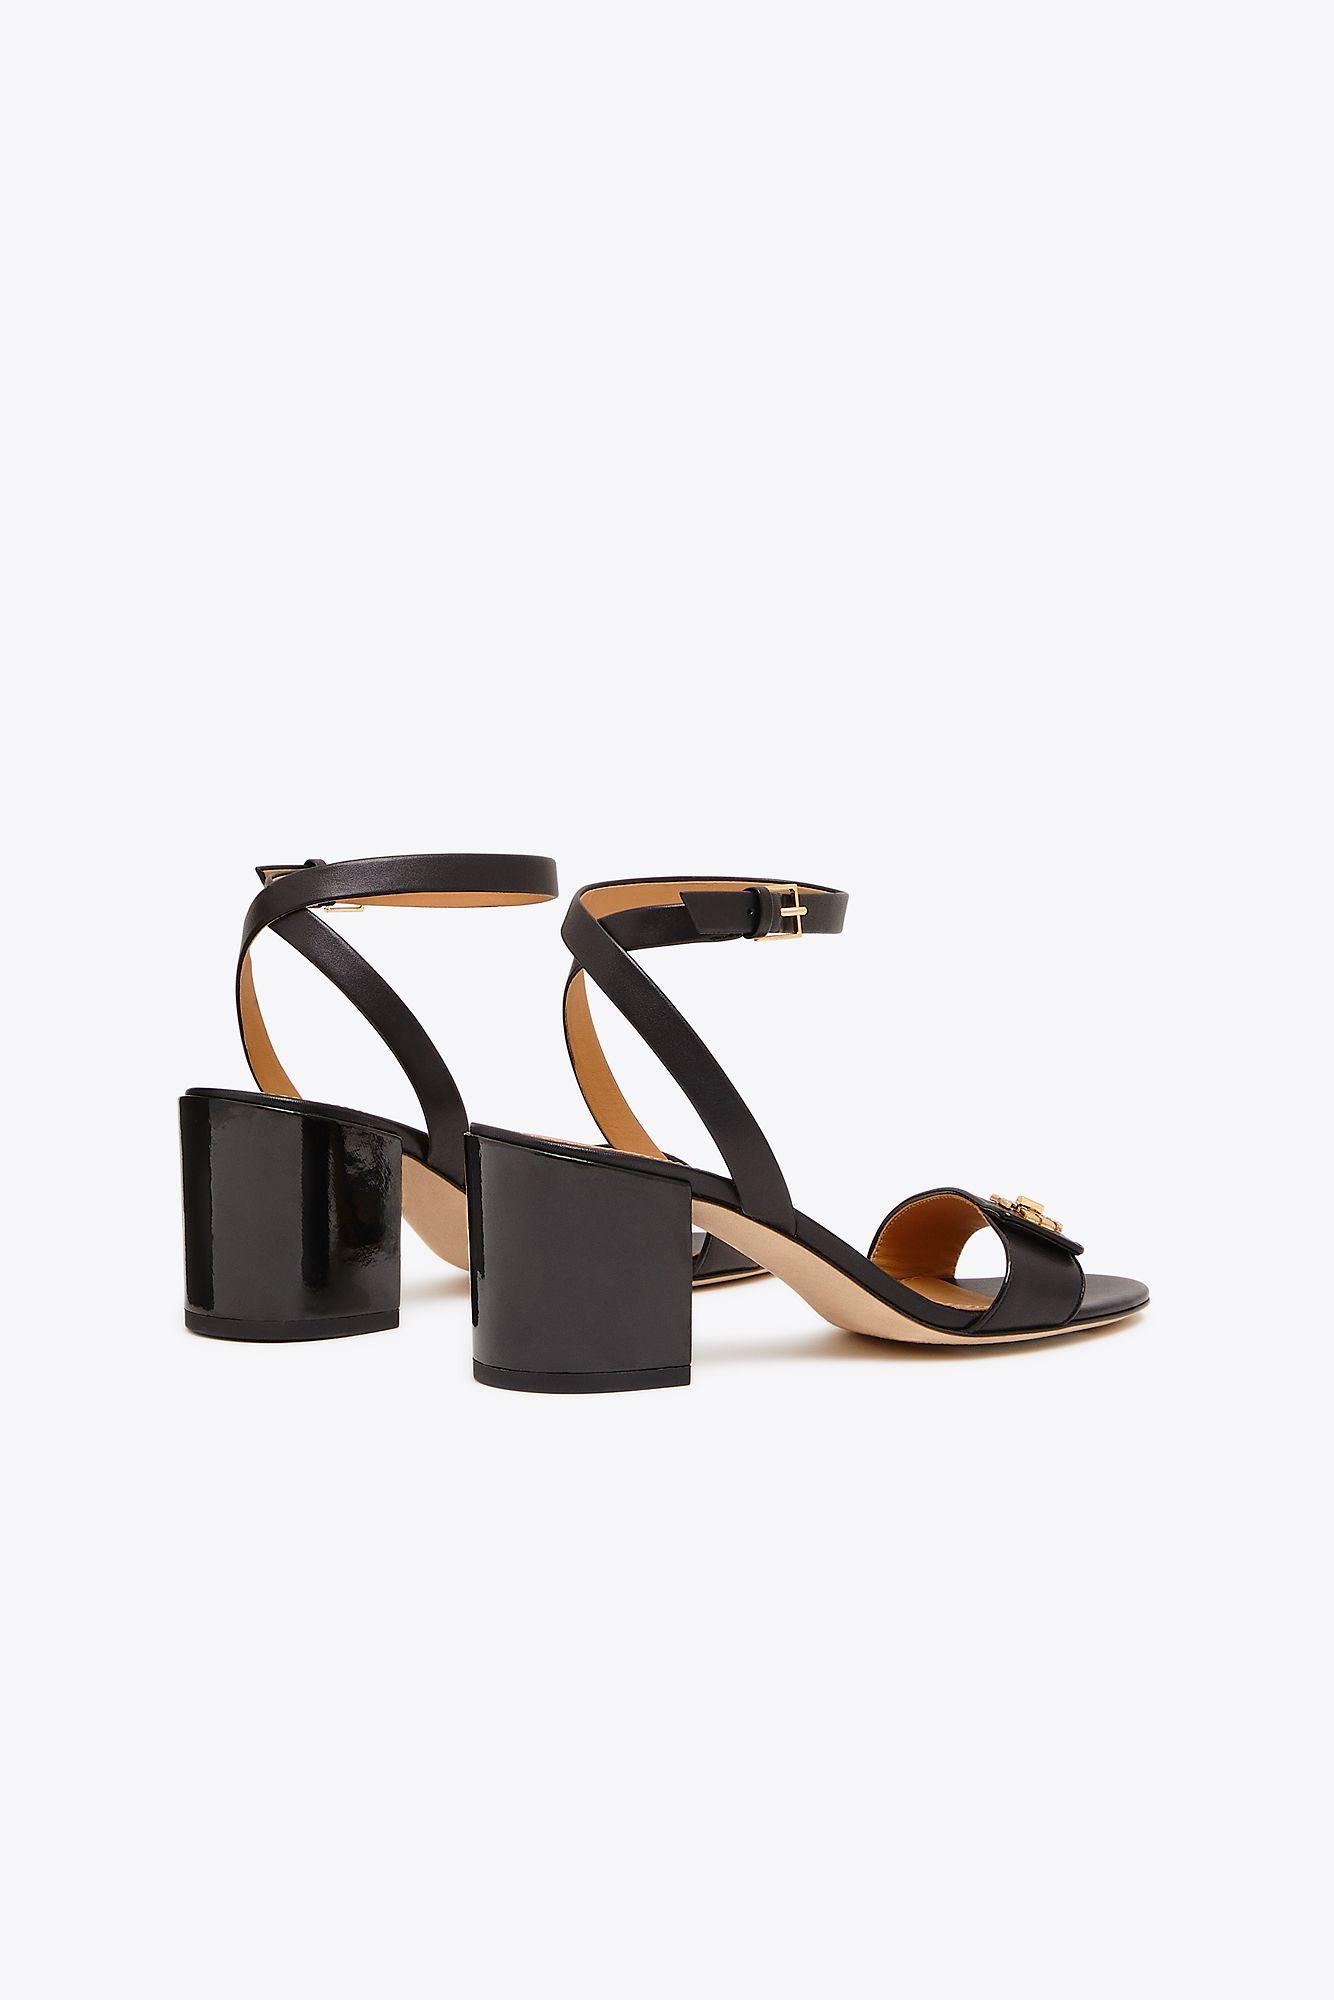 fe391789df6c52 Tory Burch - Black Women s Kira Block Heel Sandals - Lyst. View fullscreen